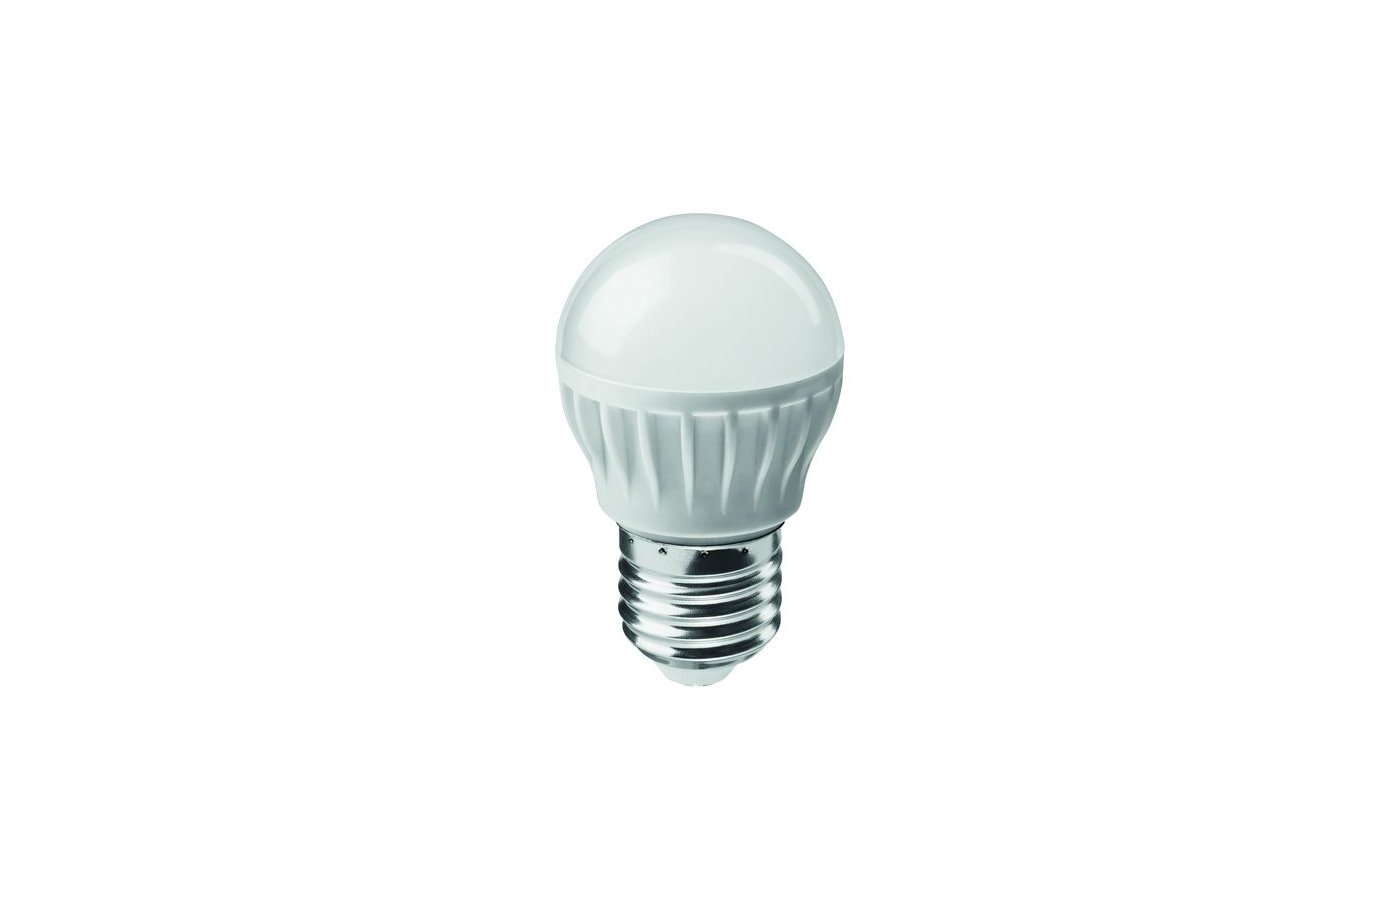 Лампочки энергосберегающие ОНЛАЙТ 71650 A60-10